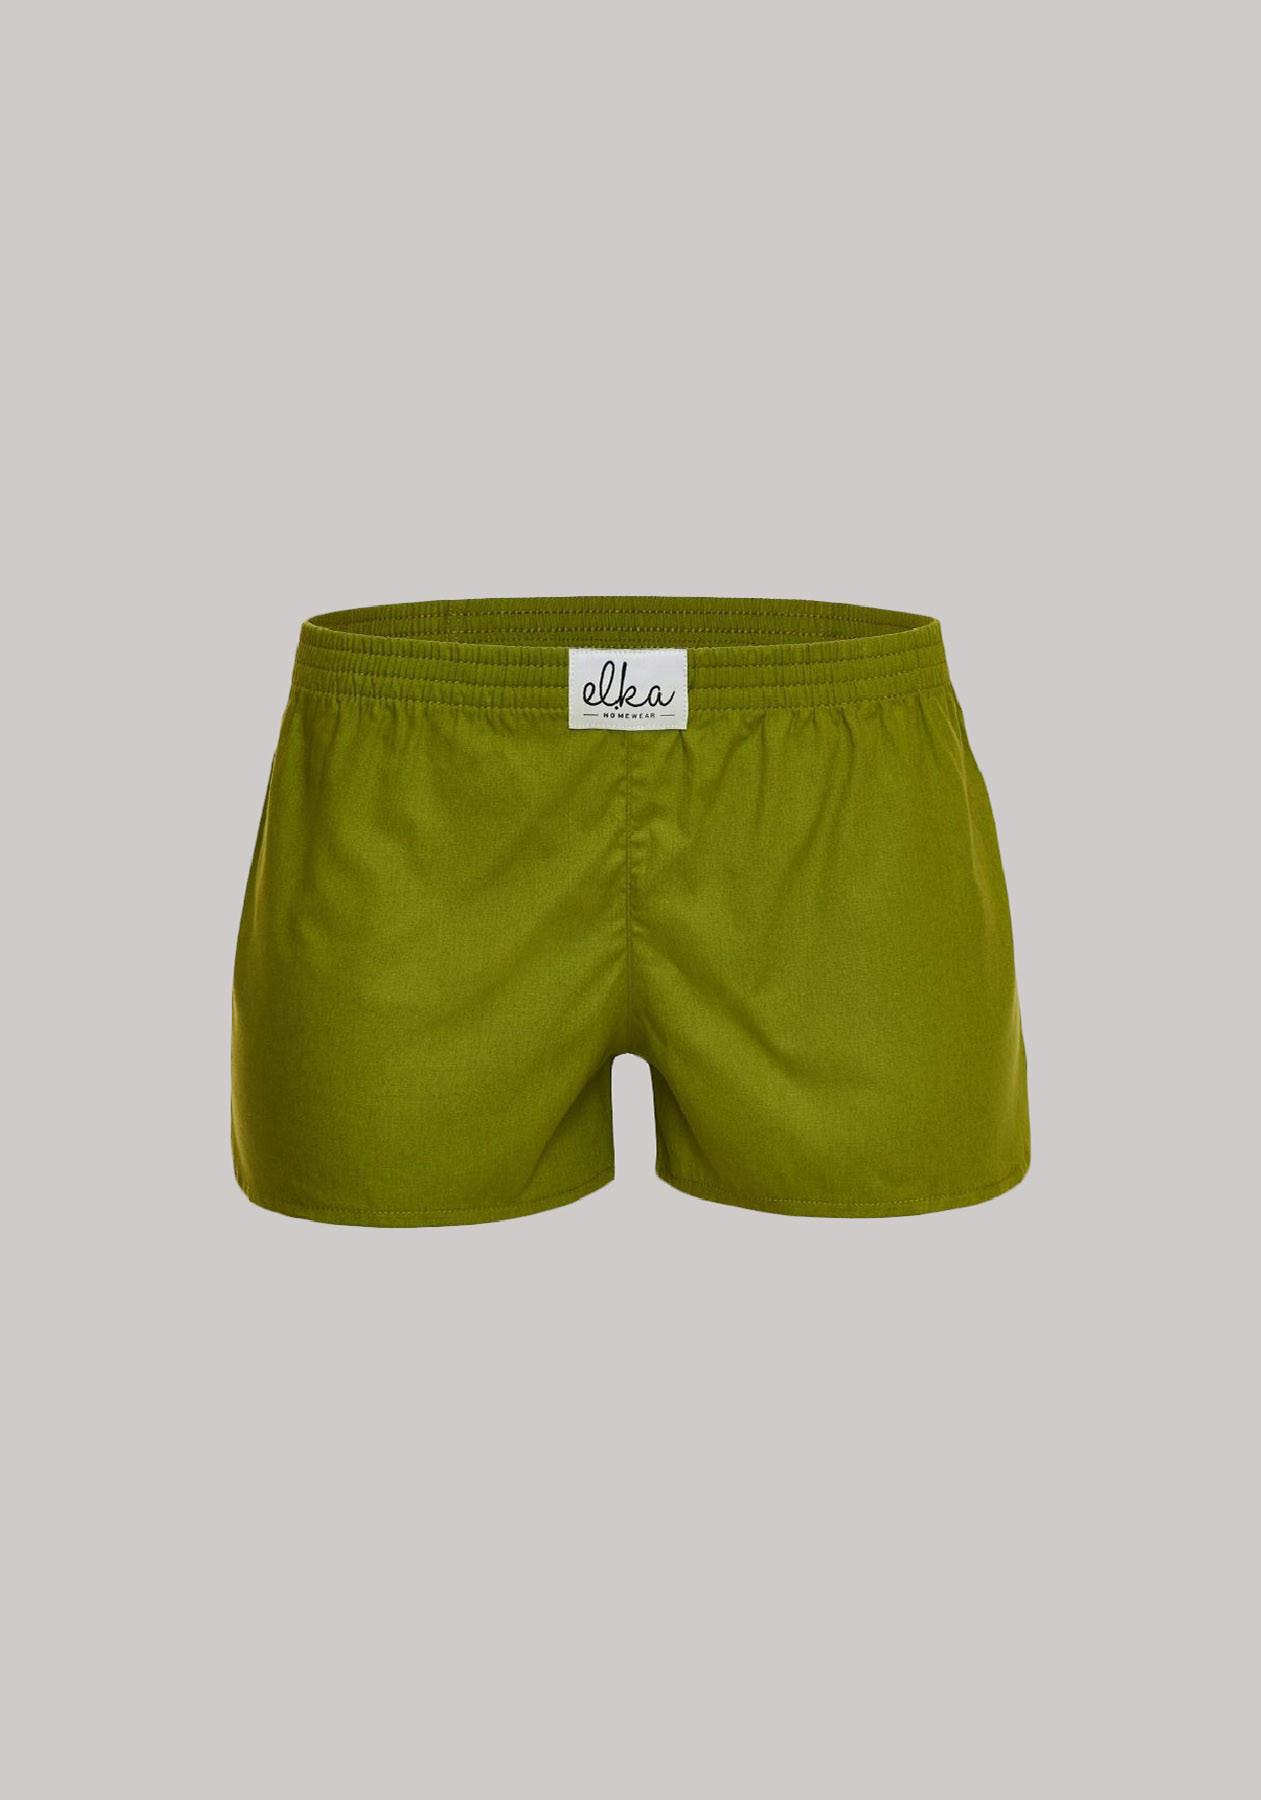 Women-Boxershorts-ELKA-Lounge-W00156